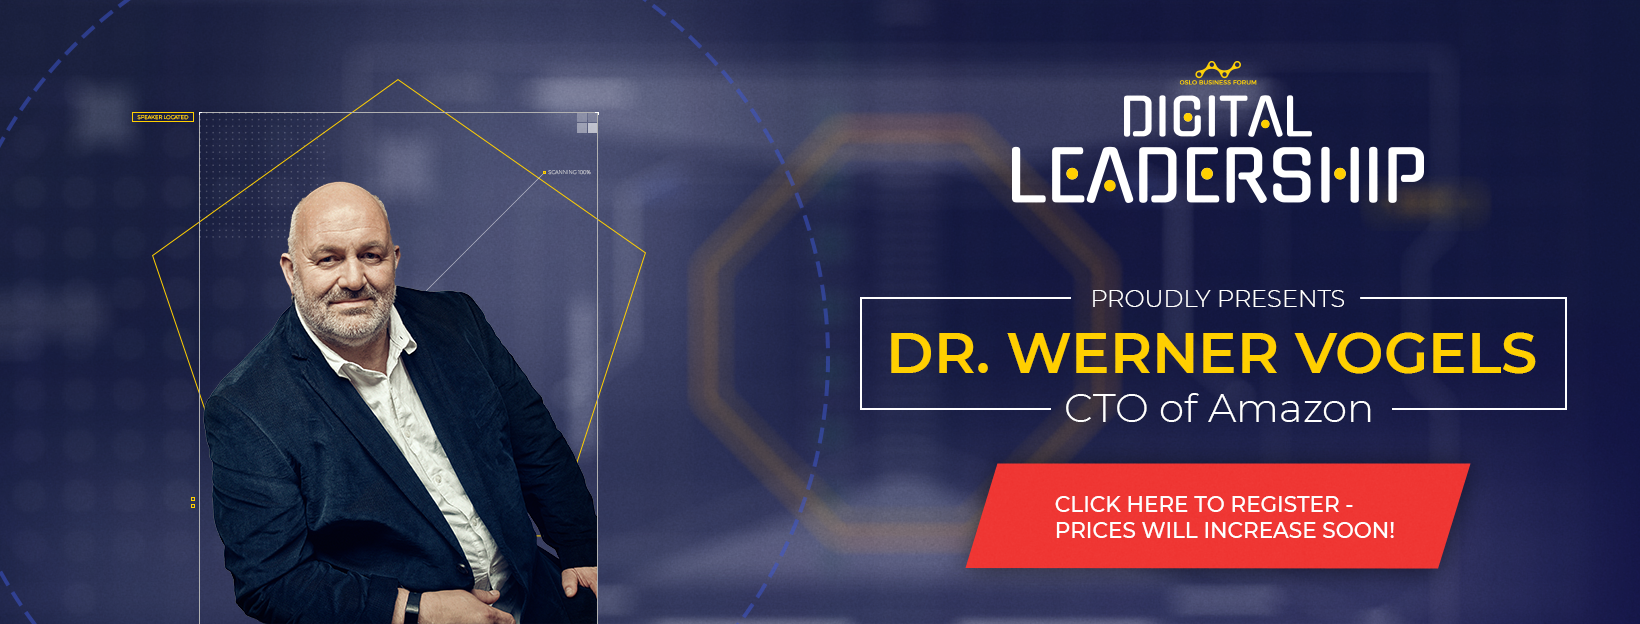 WV_Launch_Final_Obforum-Web-banner